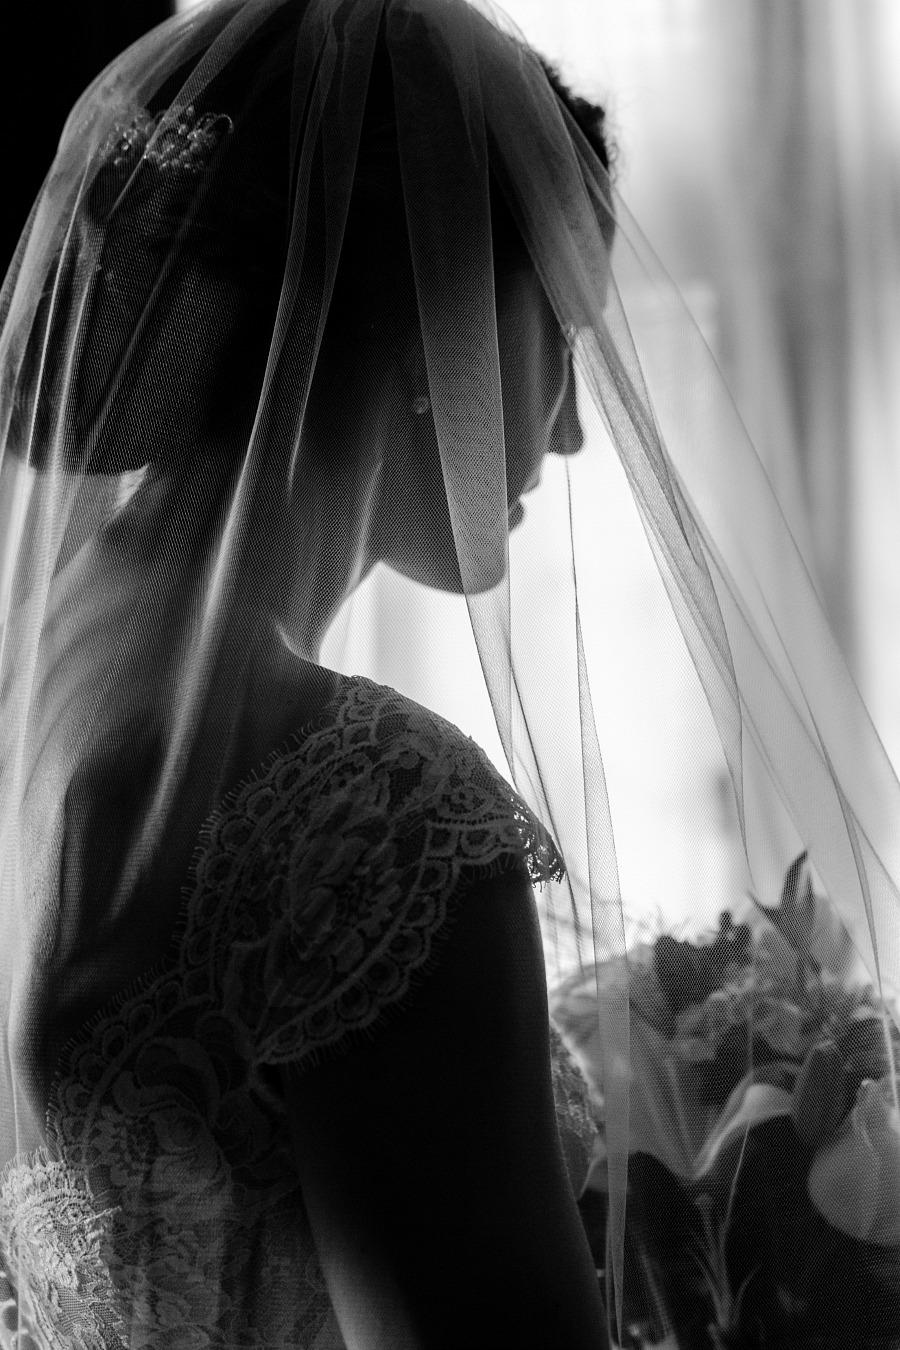 Black & White Bridal Portraits at Hermitage Museum & Gardens Norfolk, Virginia